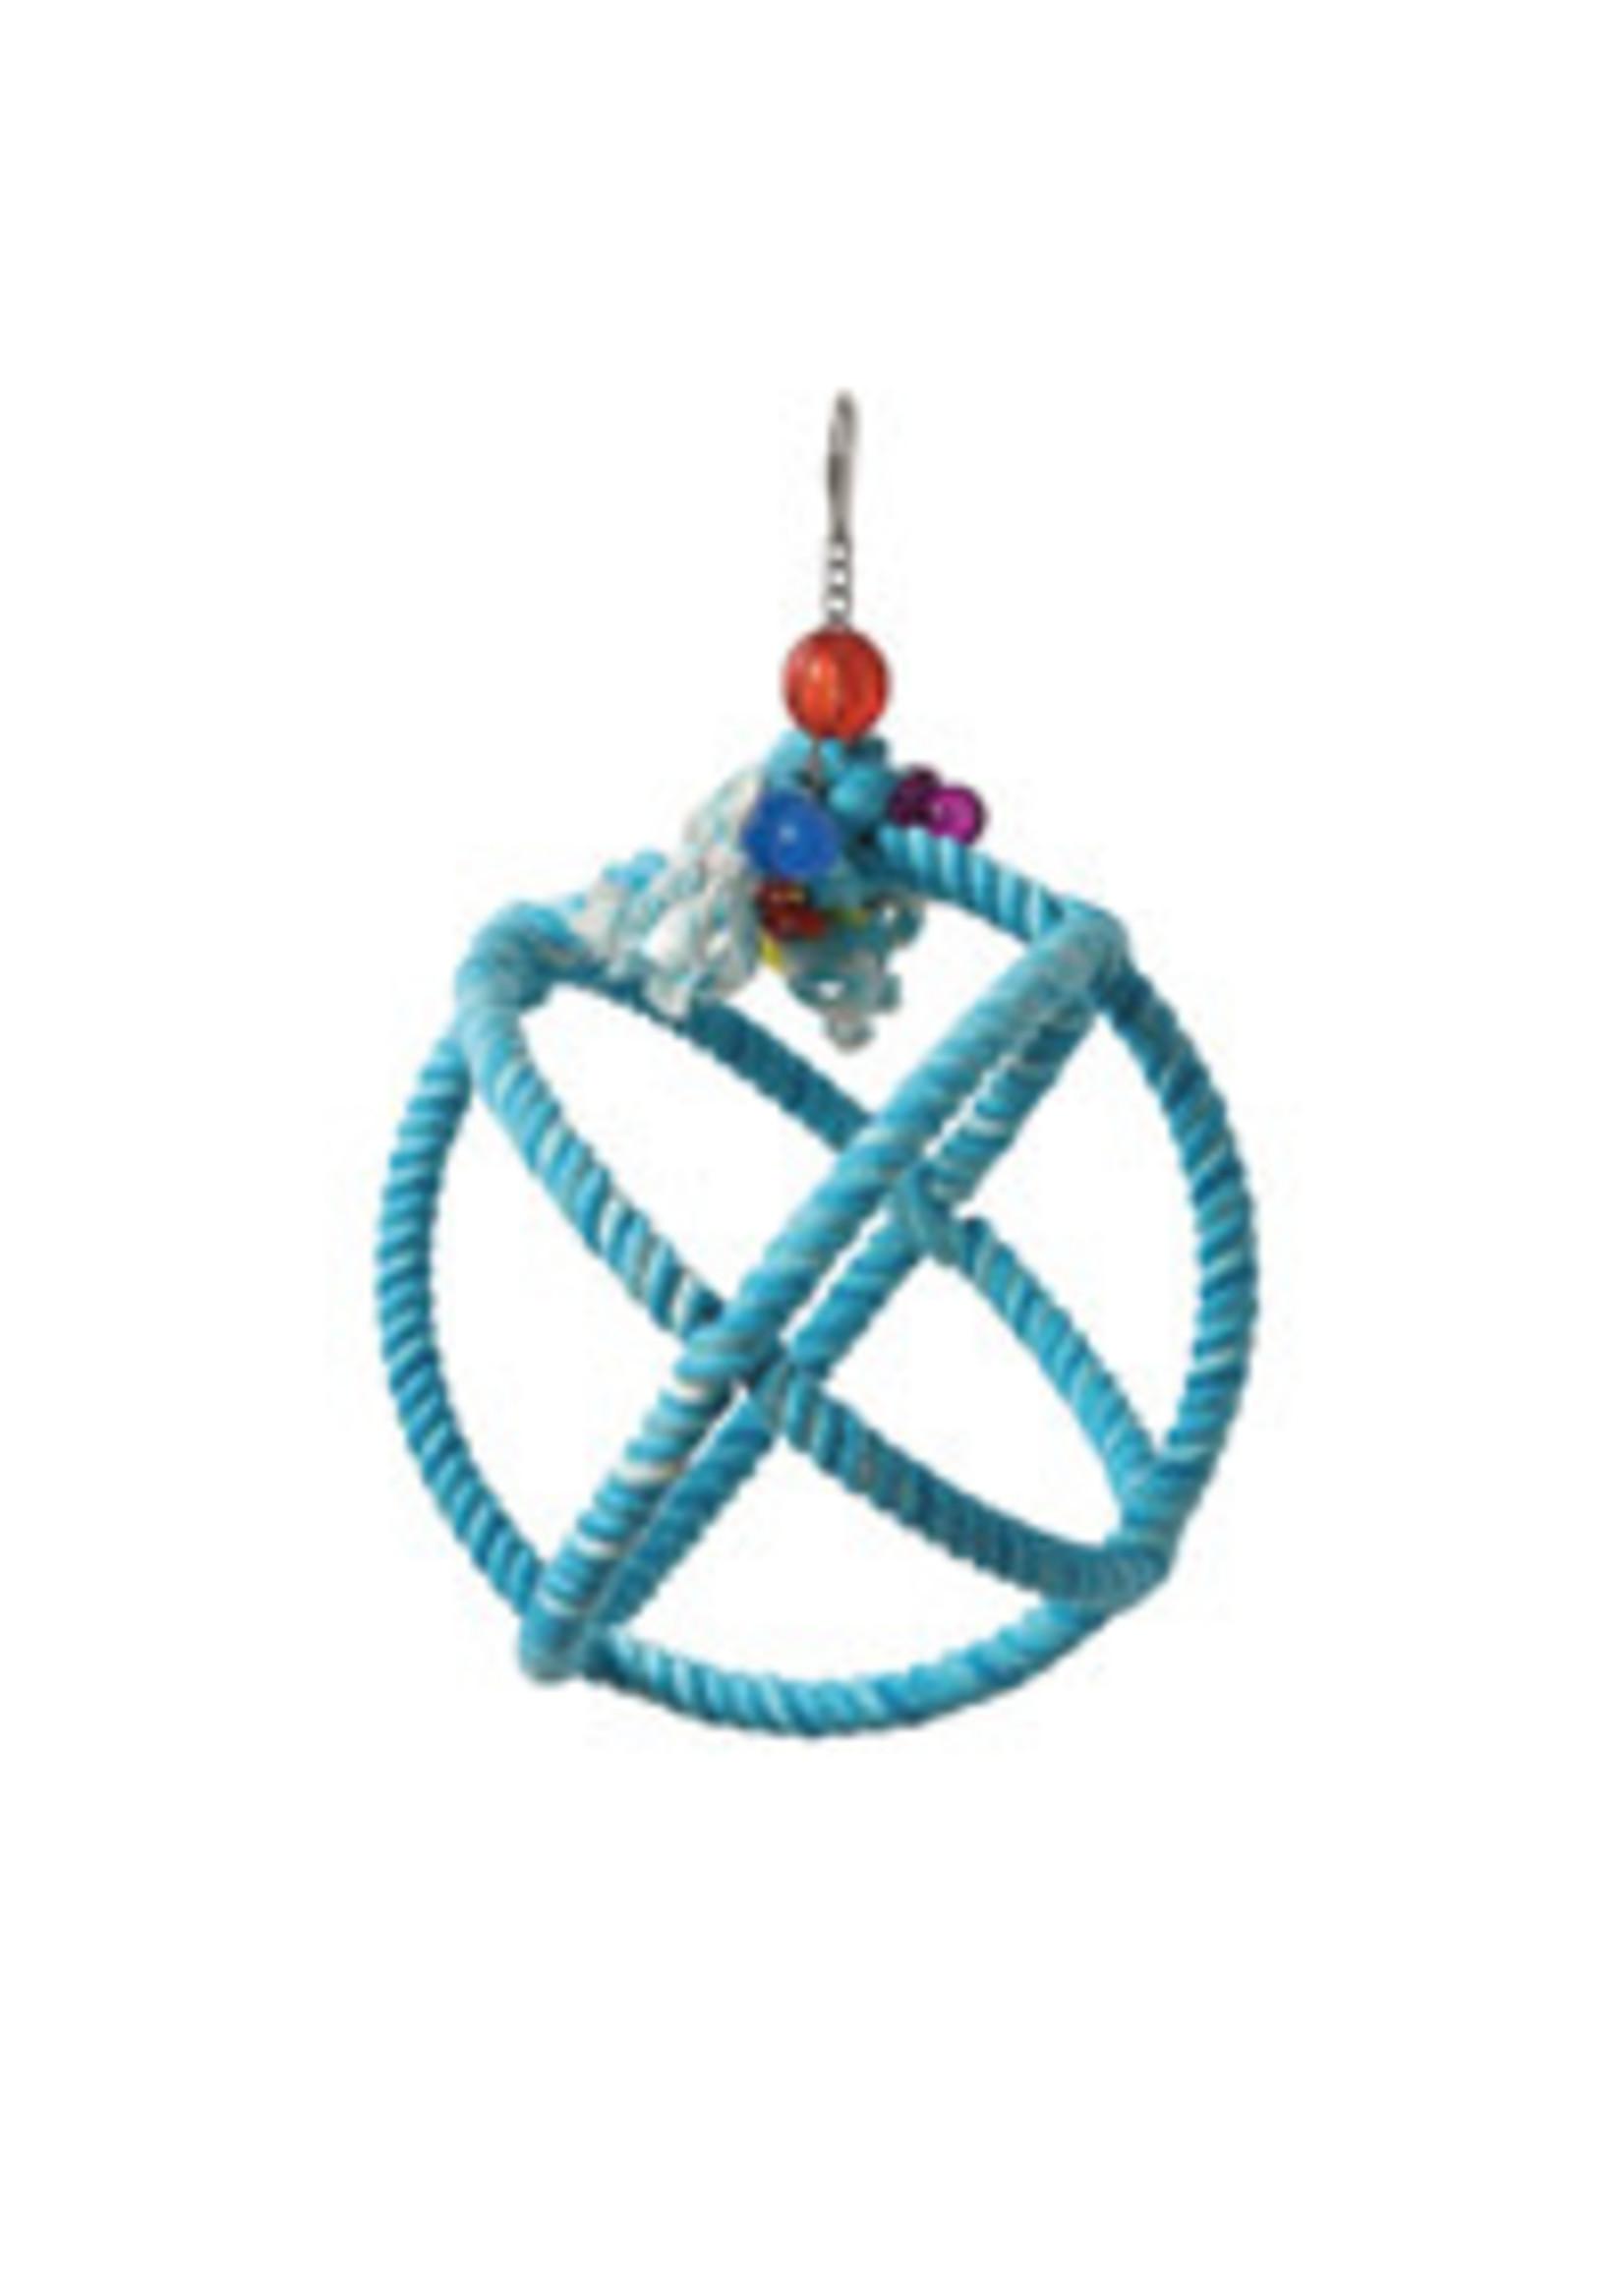 Hagen Hagen HARI SMART.PLAY Enrichment Parrot Toy - Roper Orbiter Perch n Swing - Small 81008